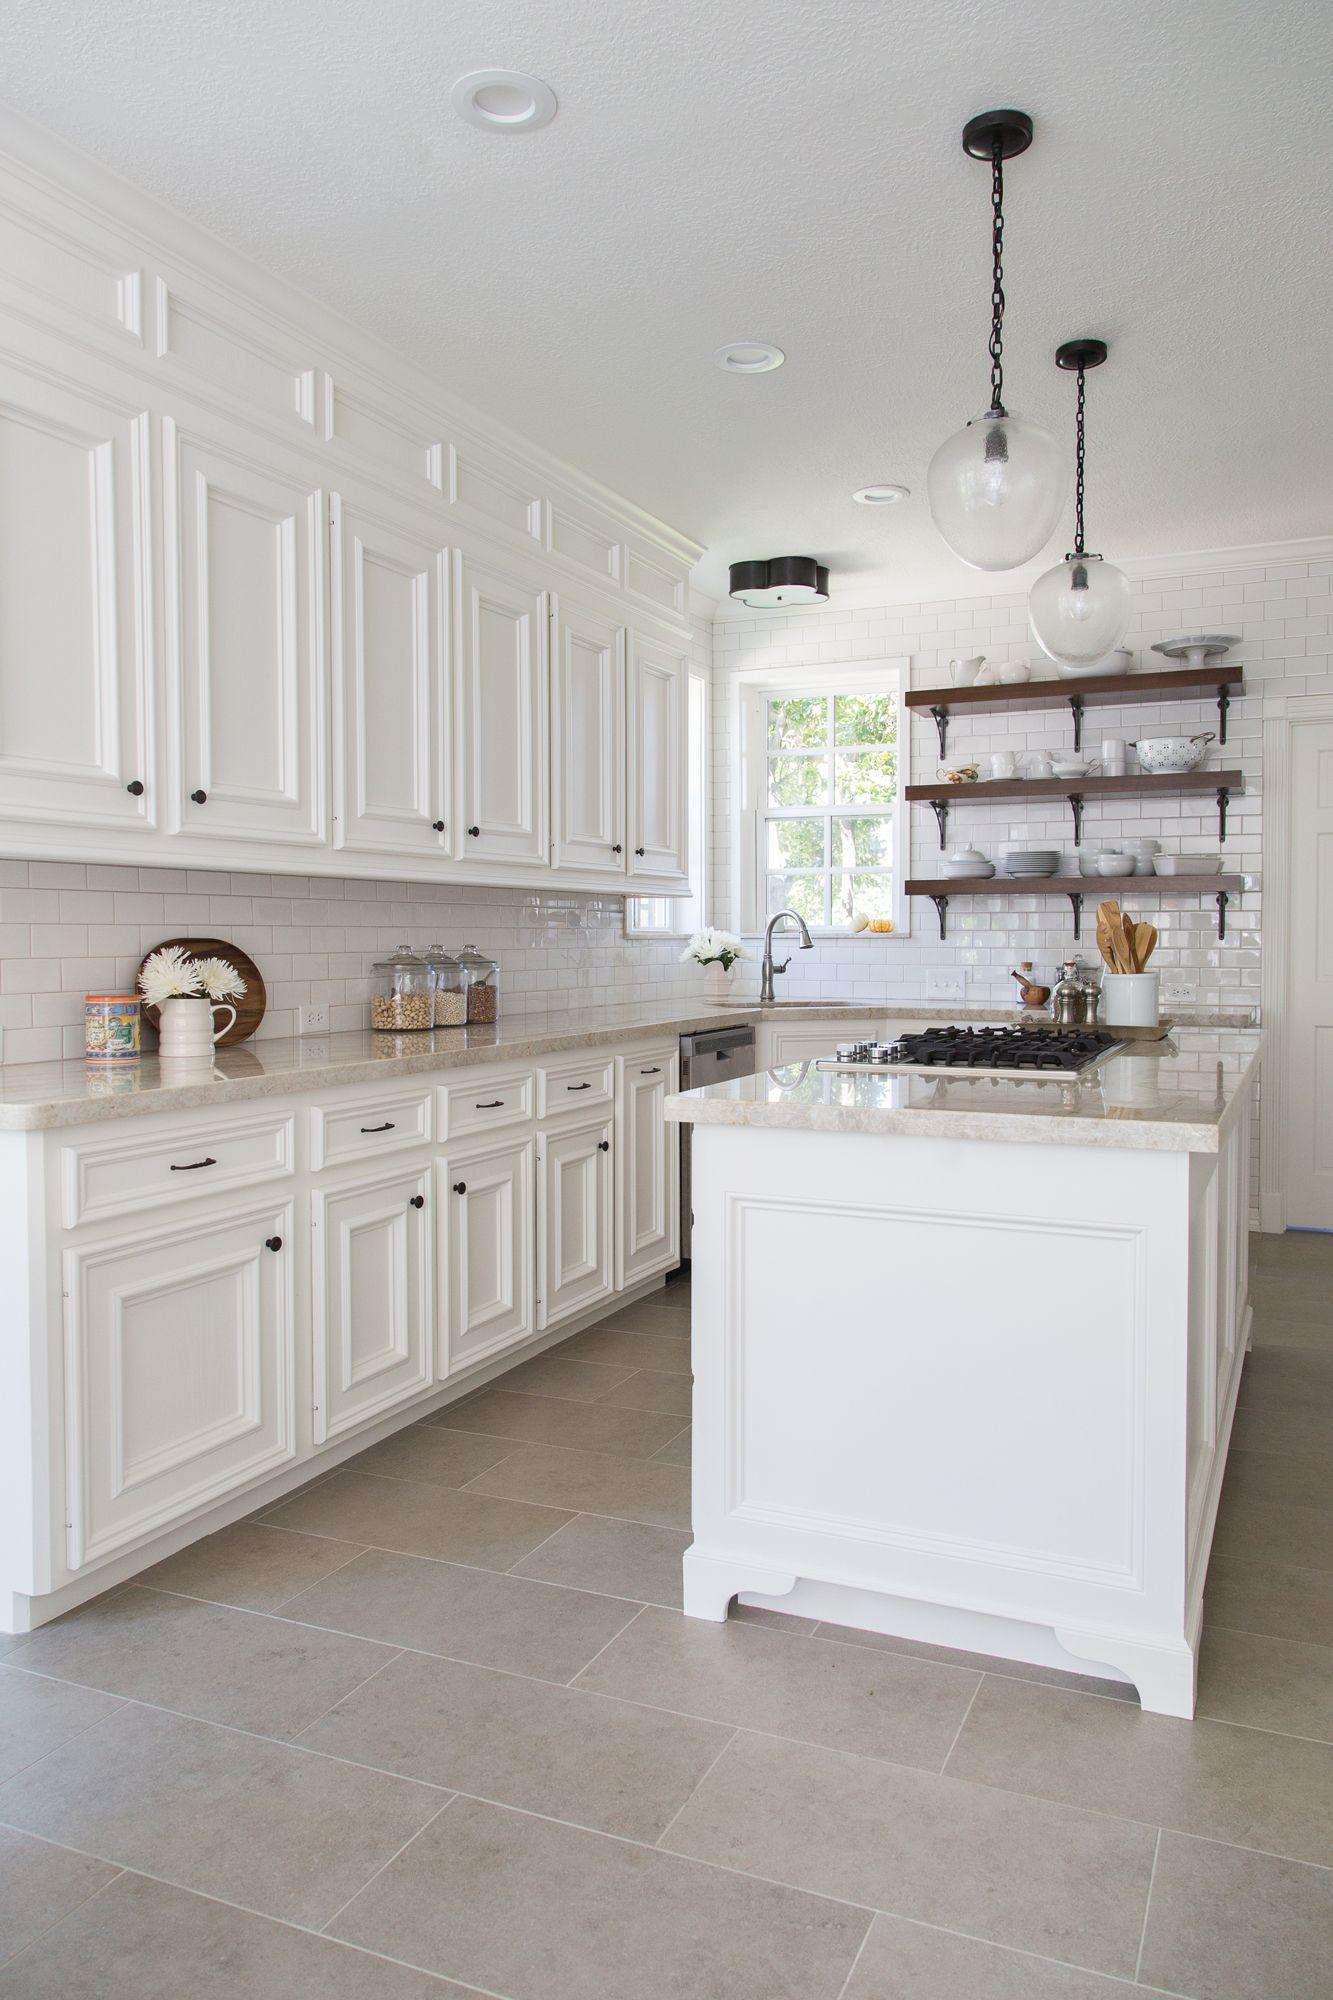 kitchen flooring with tiles farmhouse kitchen remodel | interior designer: carla aston | photographer: XNQNSDB